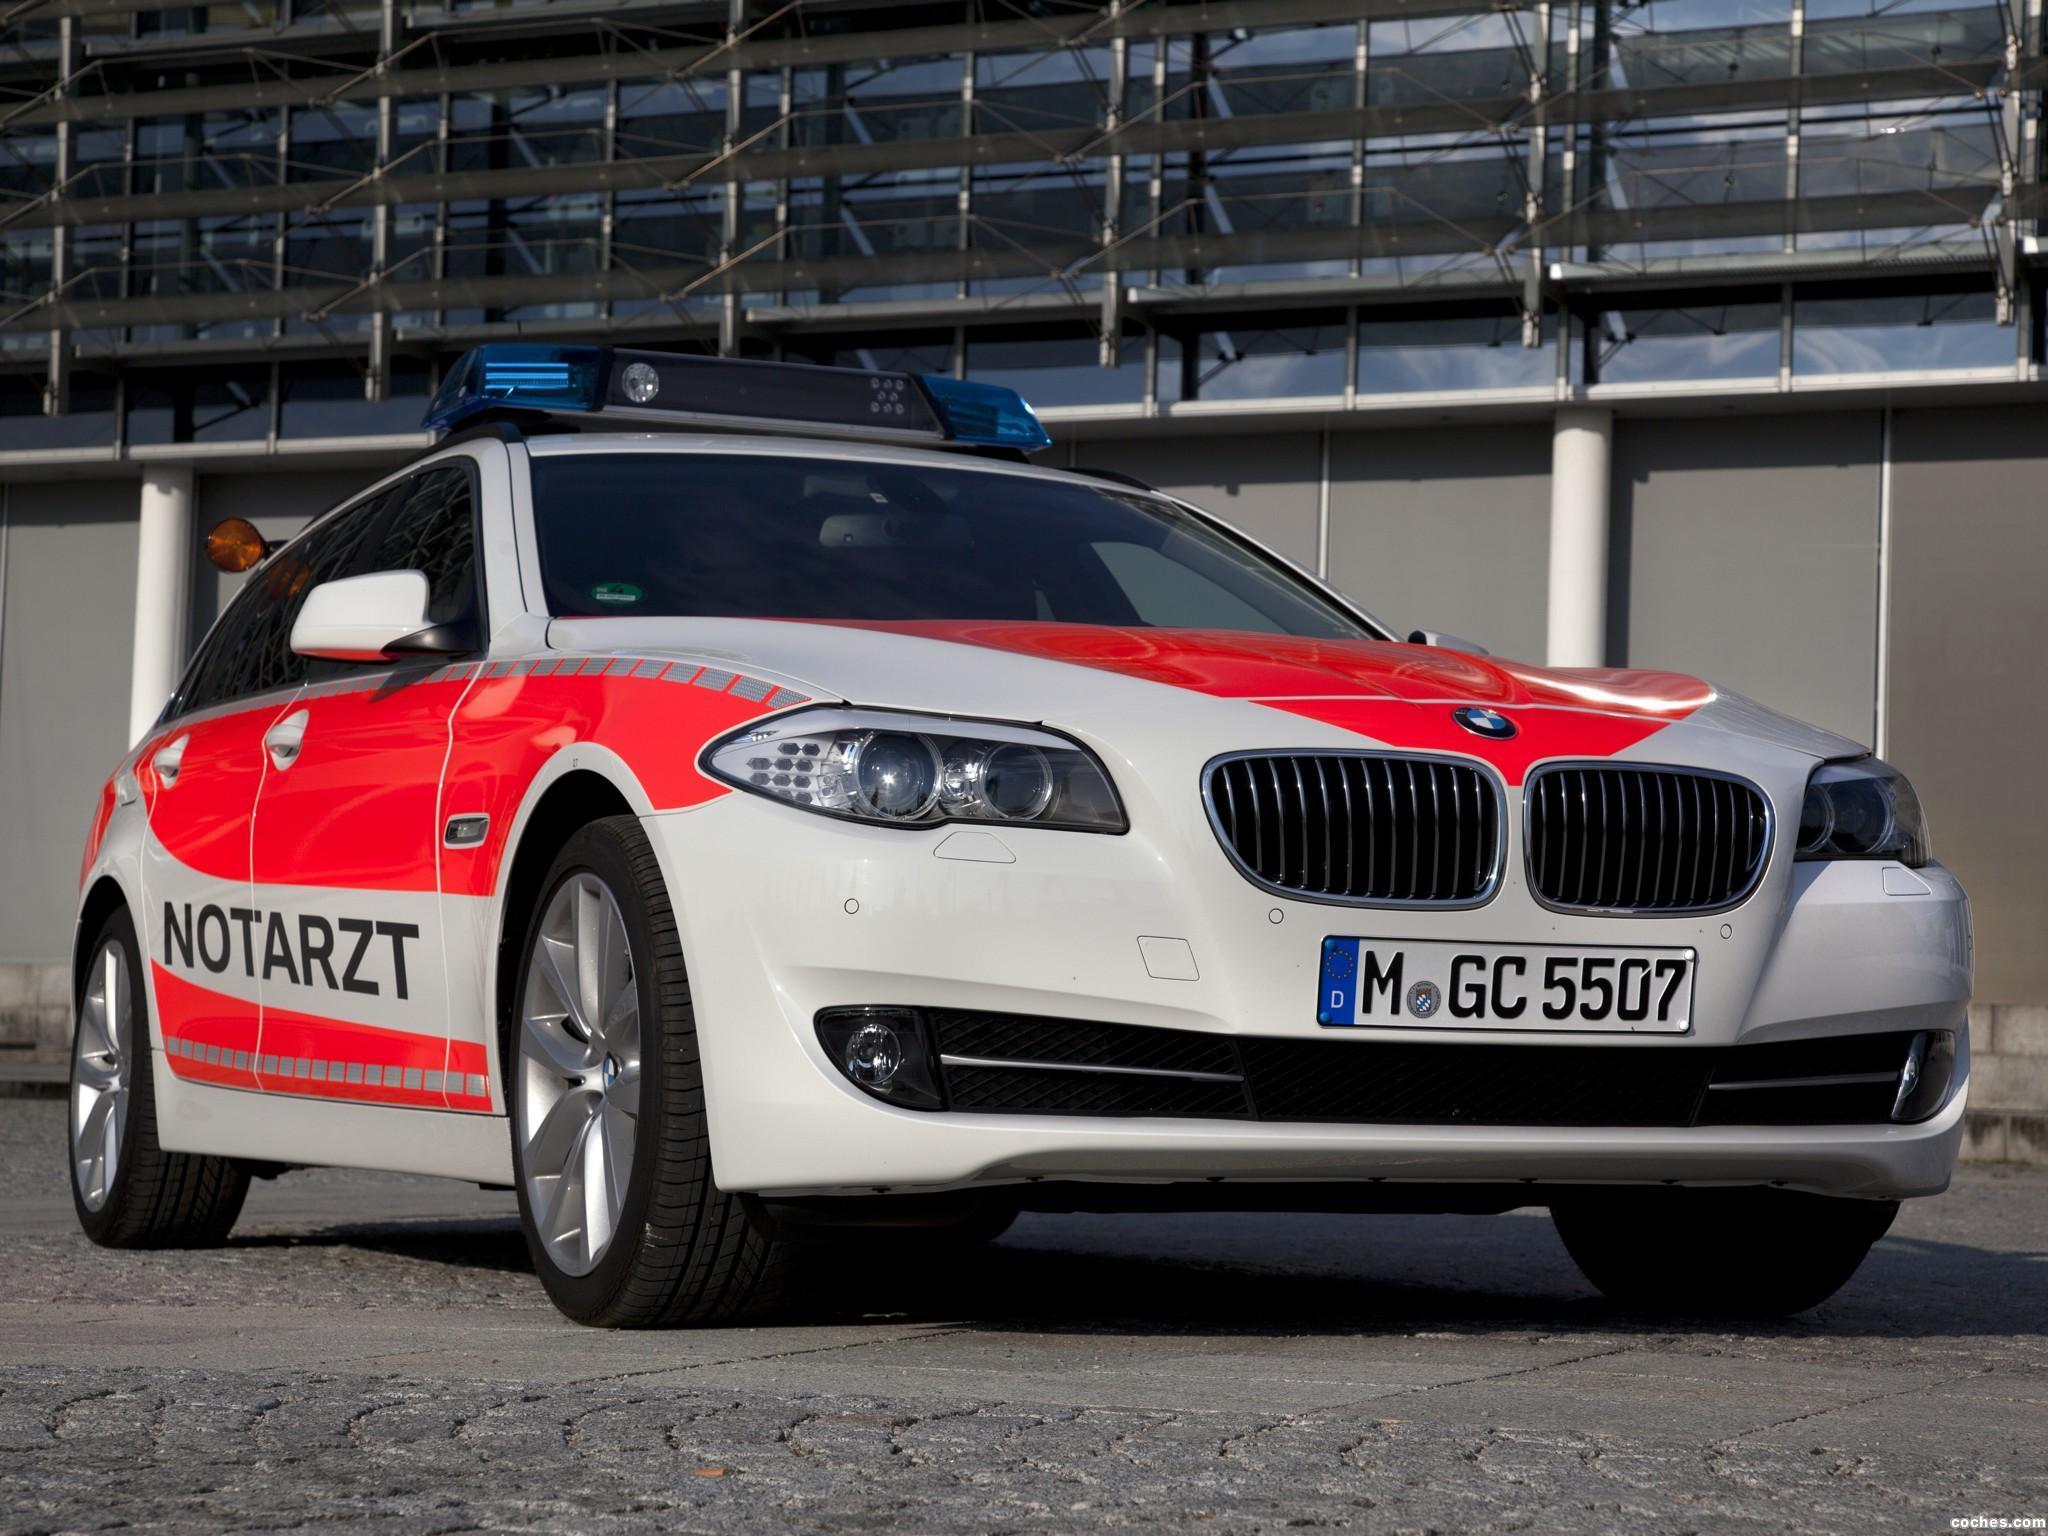 Foto 0 de BMW Serie 5 Touring Notarzt F11 2011